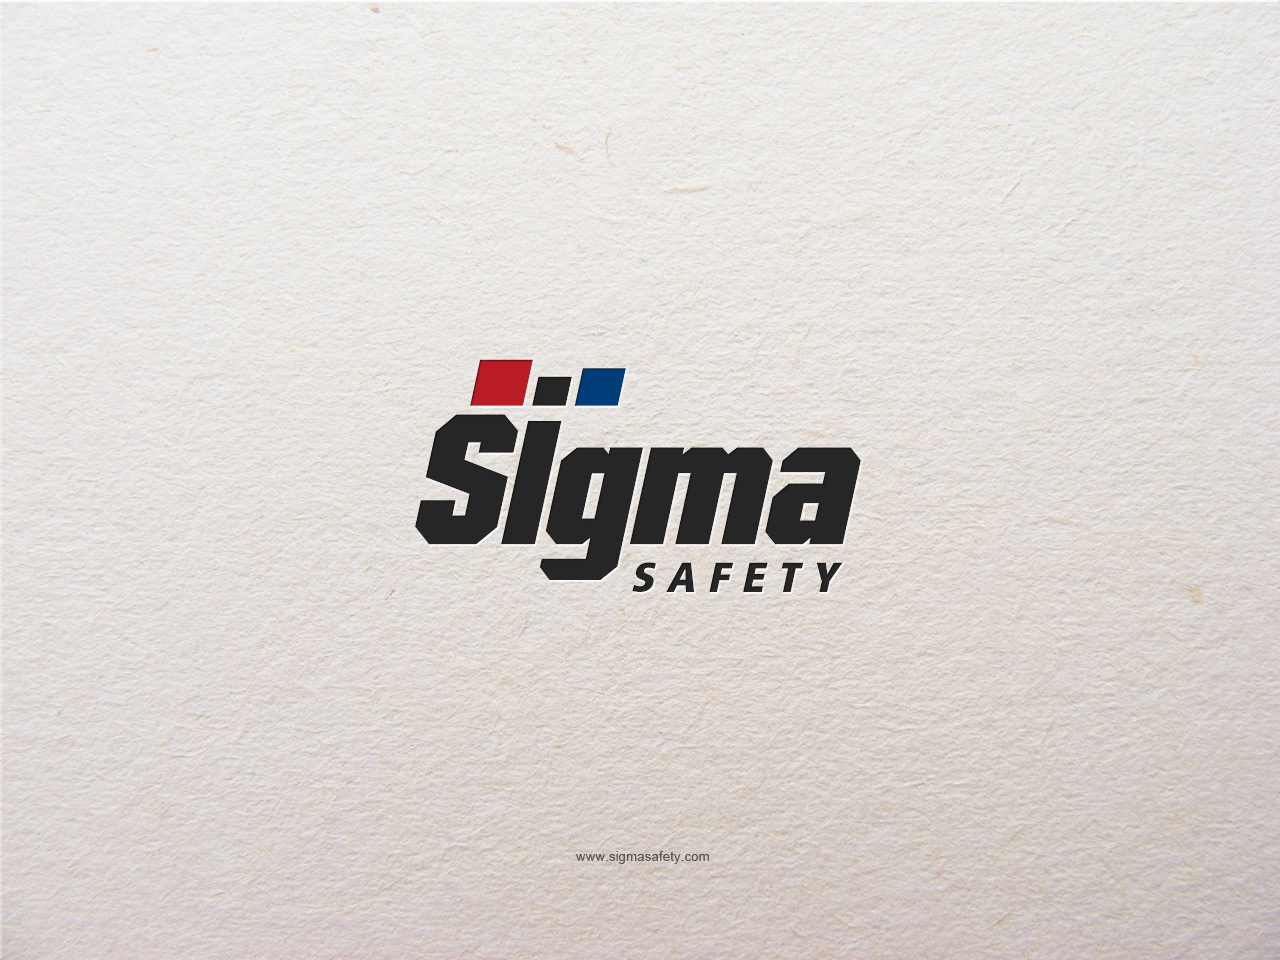 Logo Design by jpbituin - Entry No. 88 in the Logo Design Contest Creative Logo Design for Sigma Safety Corporation.